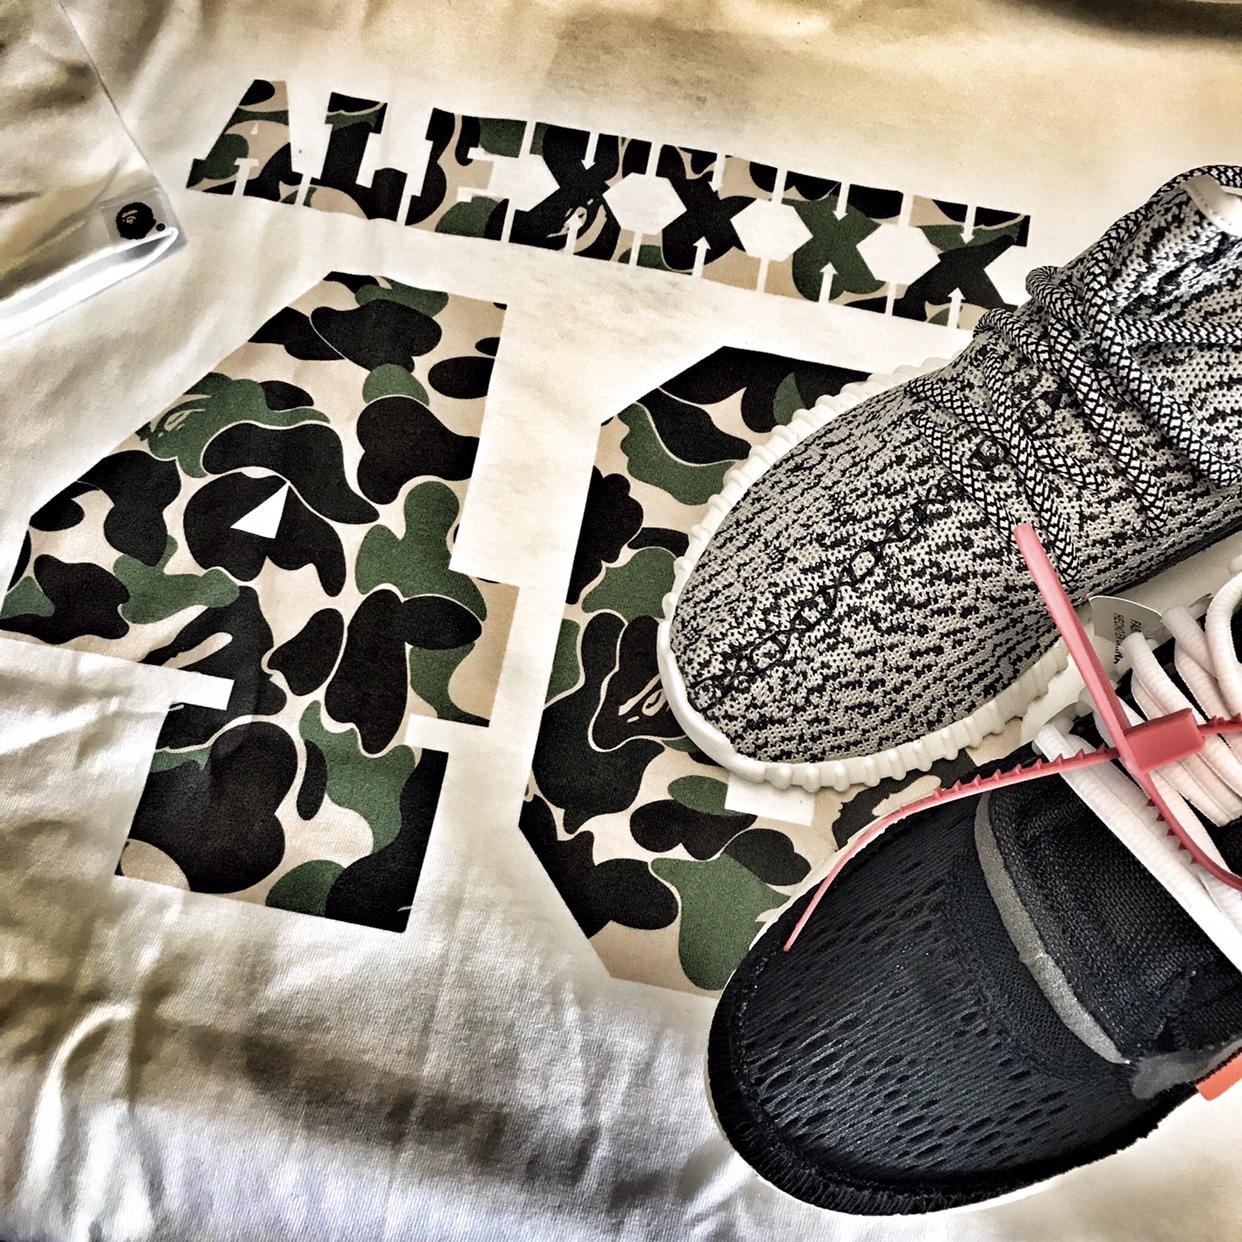 alexxxx666